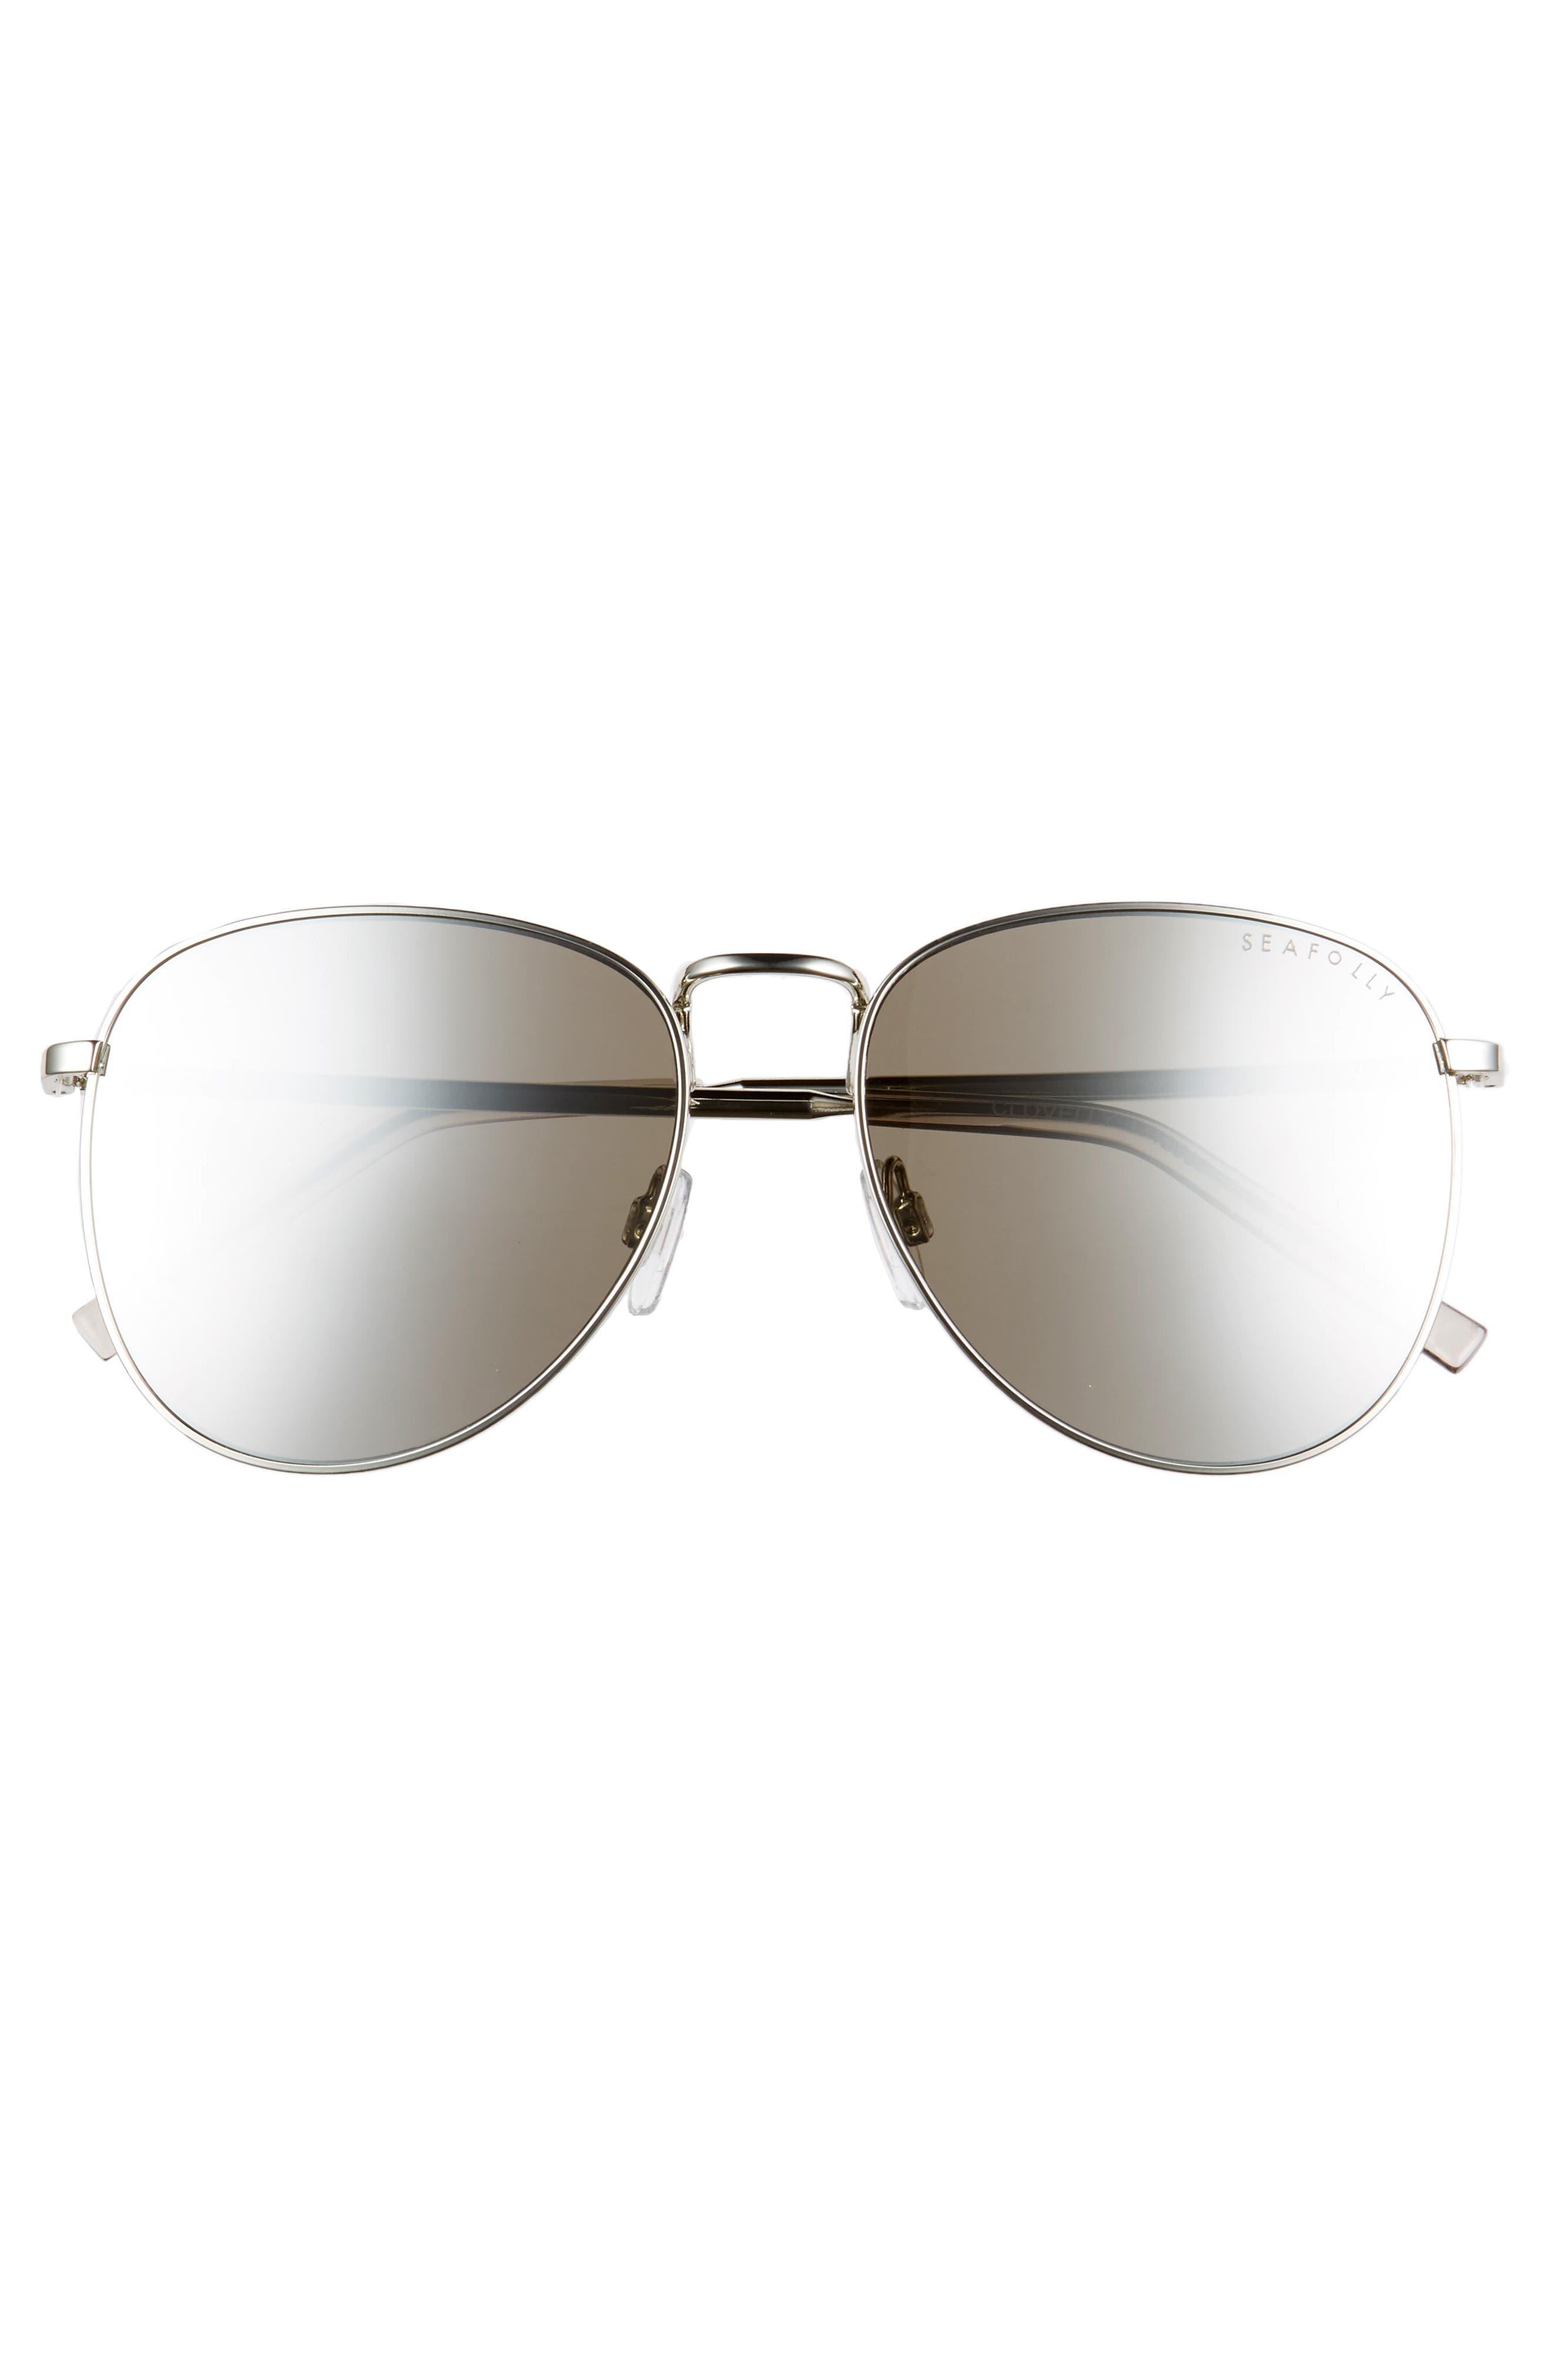 Clovelly 56mm Metal Sunglasses,                             Alternate thumbnail 3, color,                             Sand